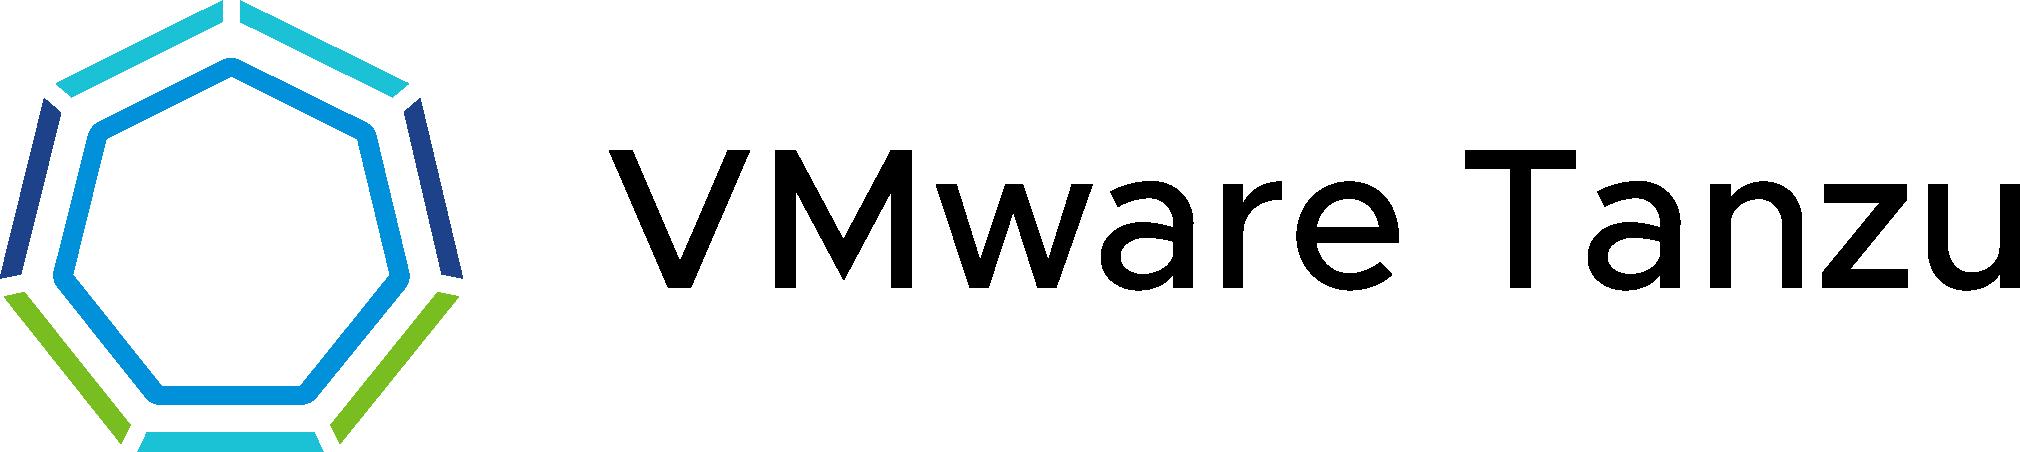 TZLG-VMwareTanzu